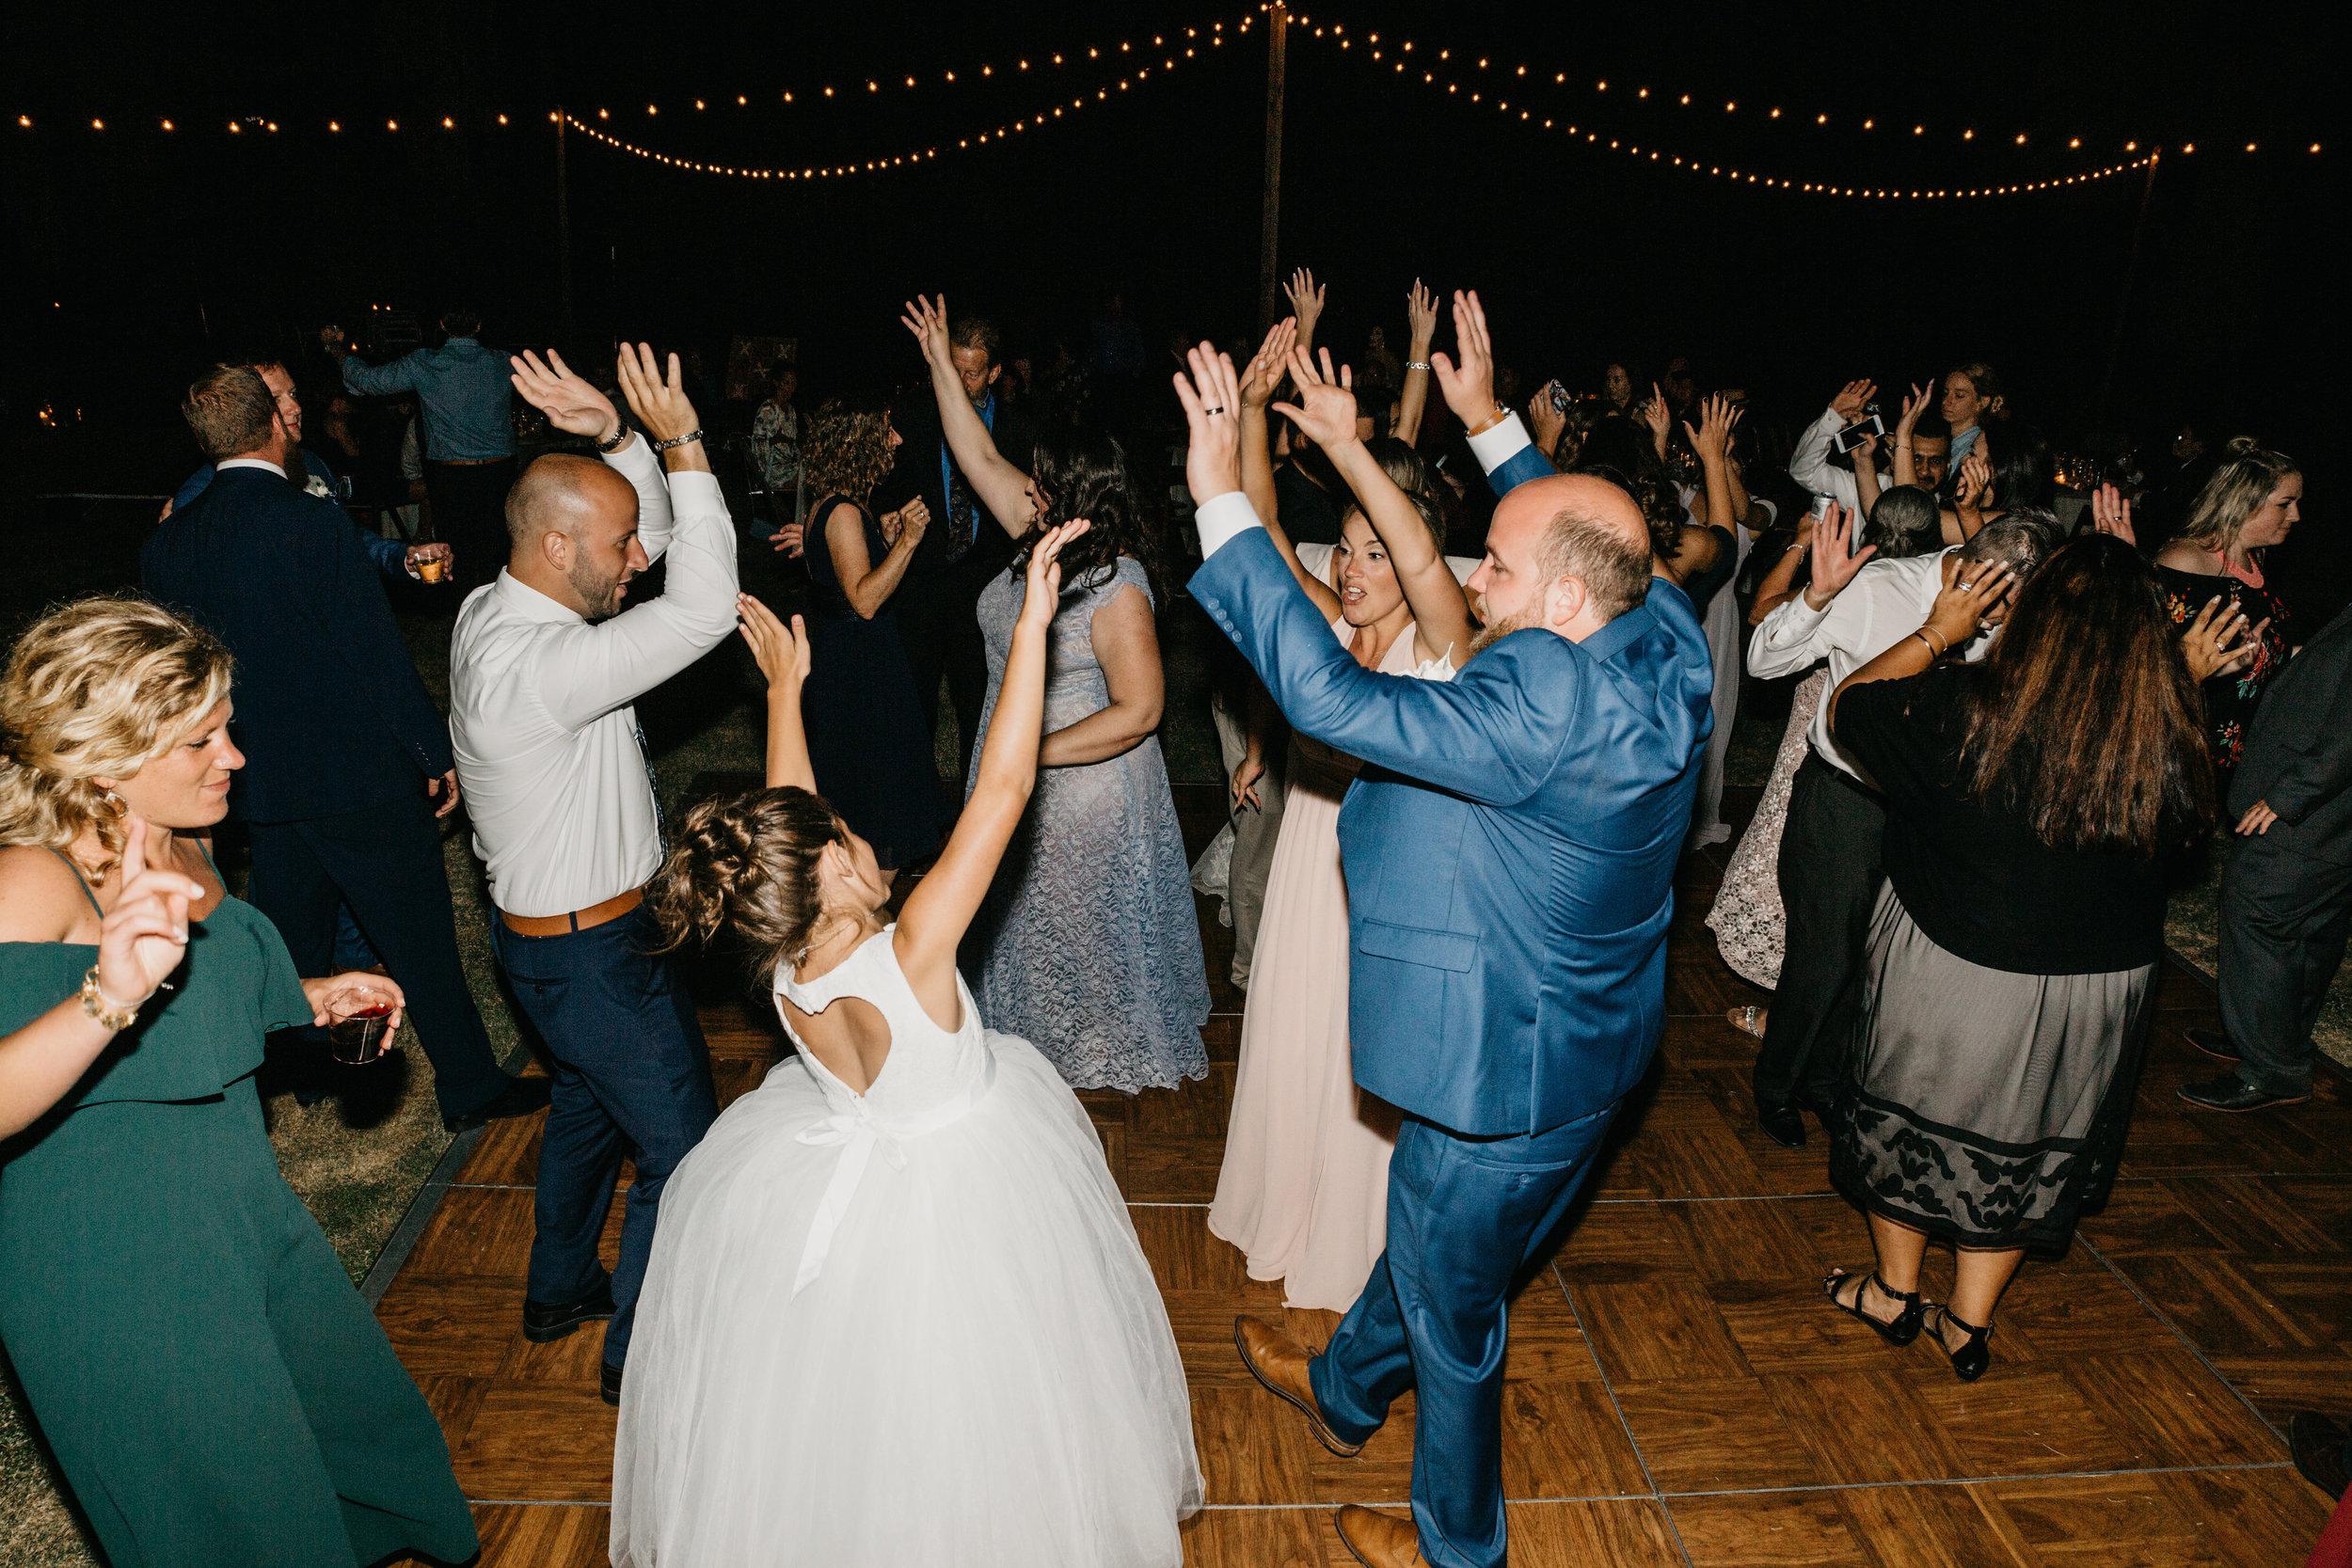 DianaLakePhoto-L+M-San-Diego-Wedding-Reception128.jpg